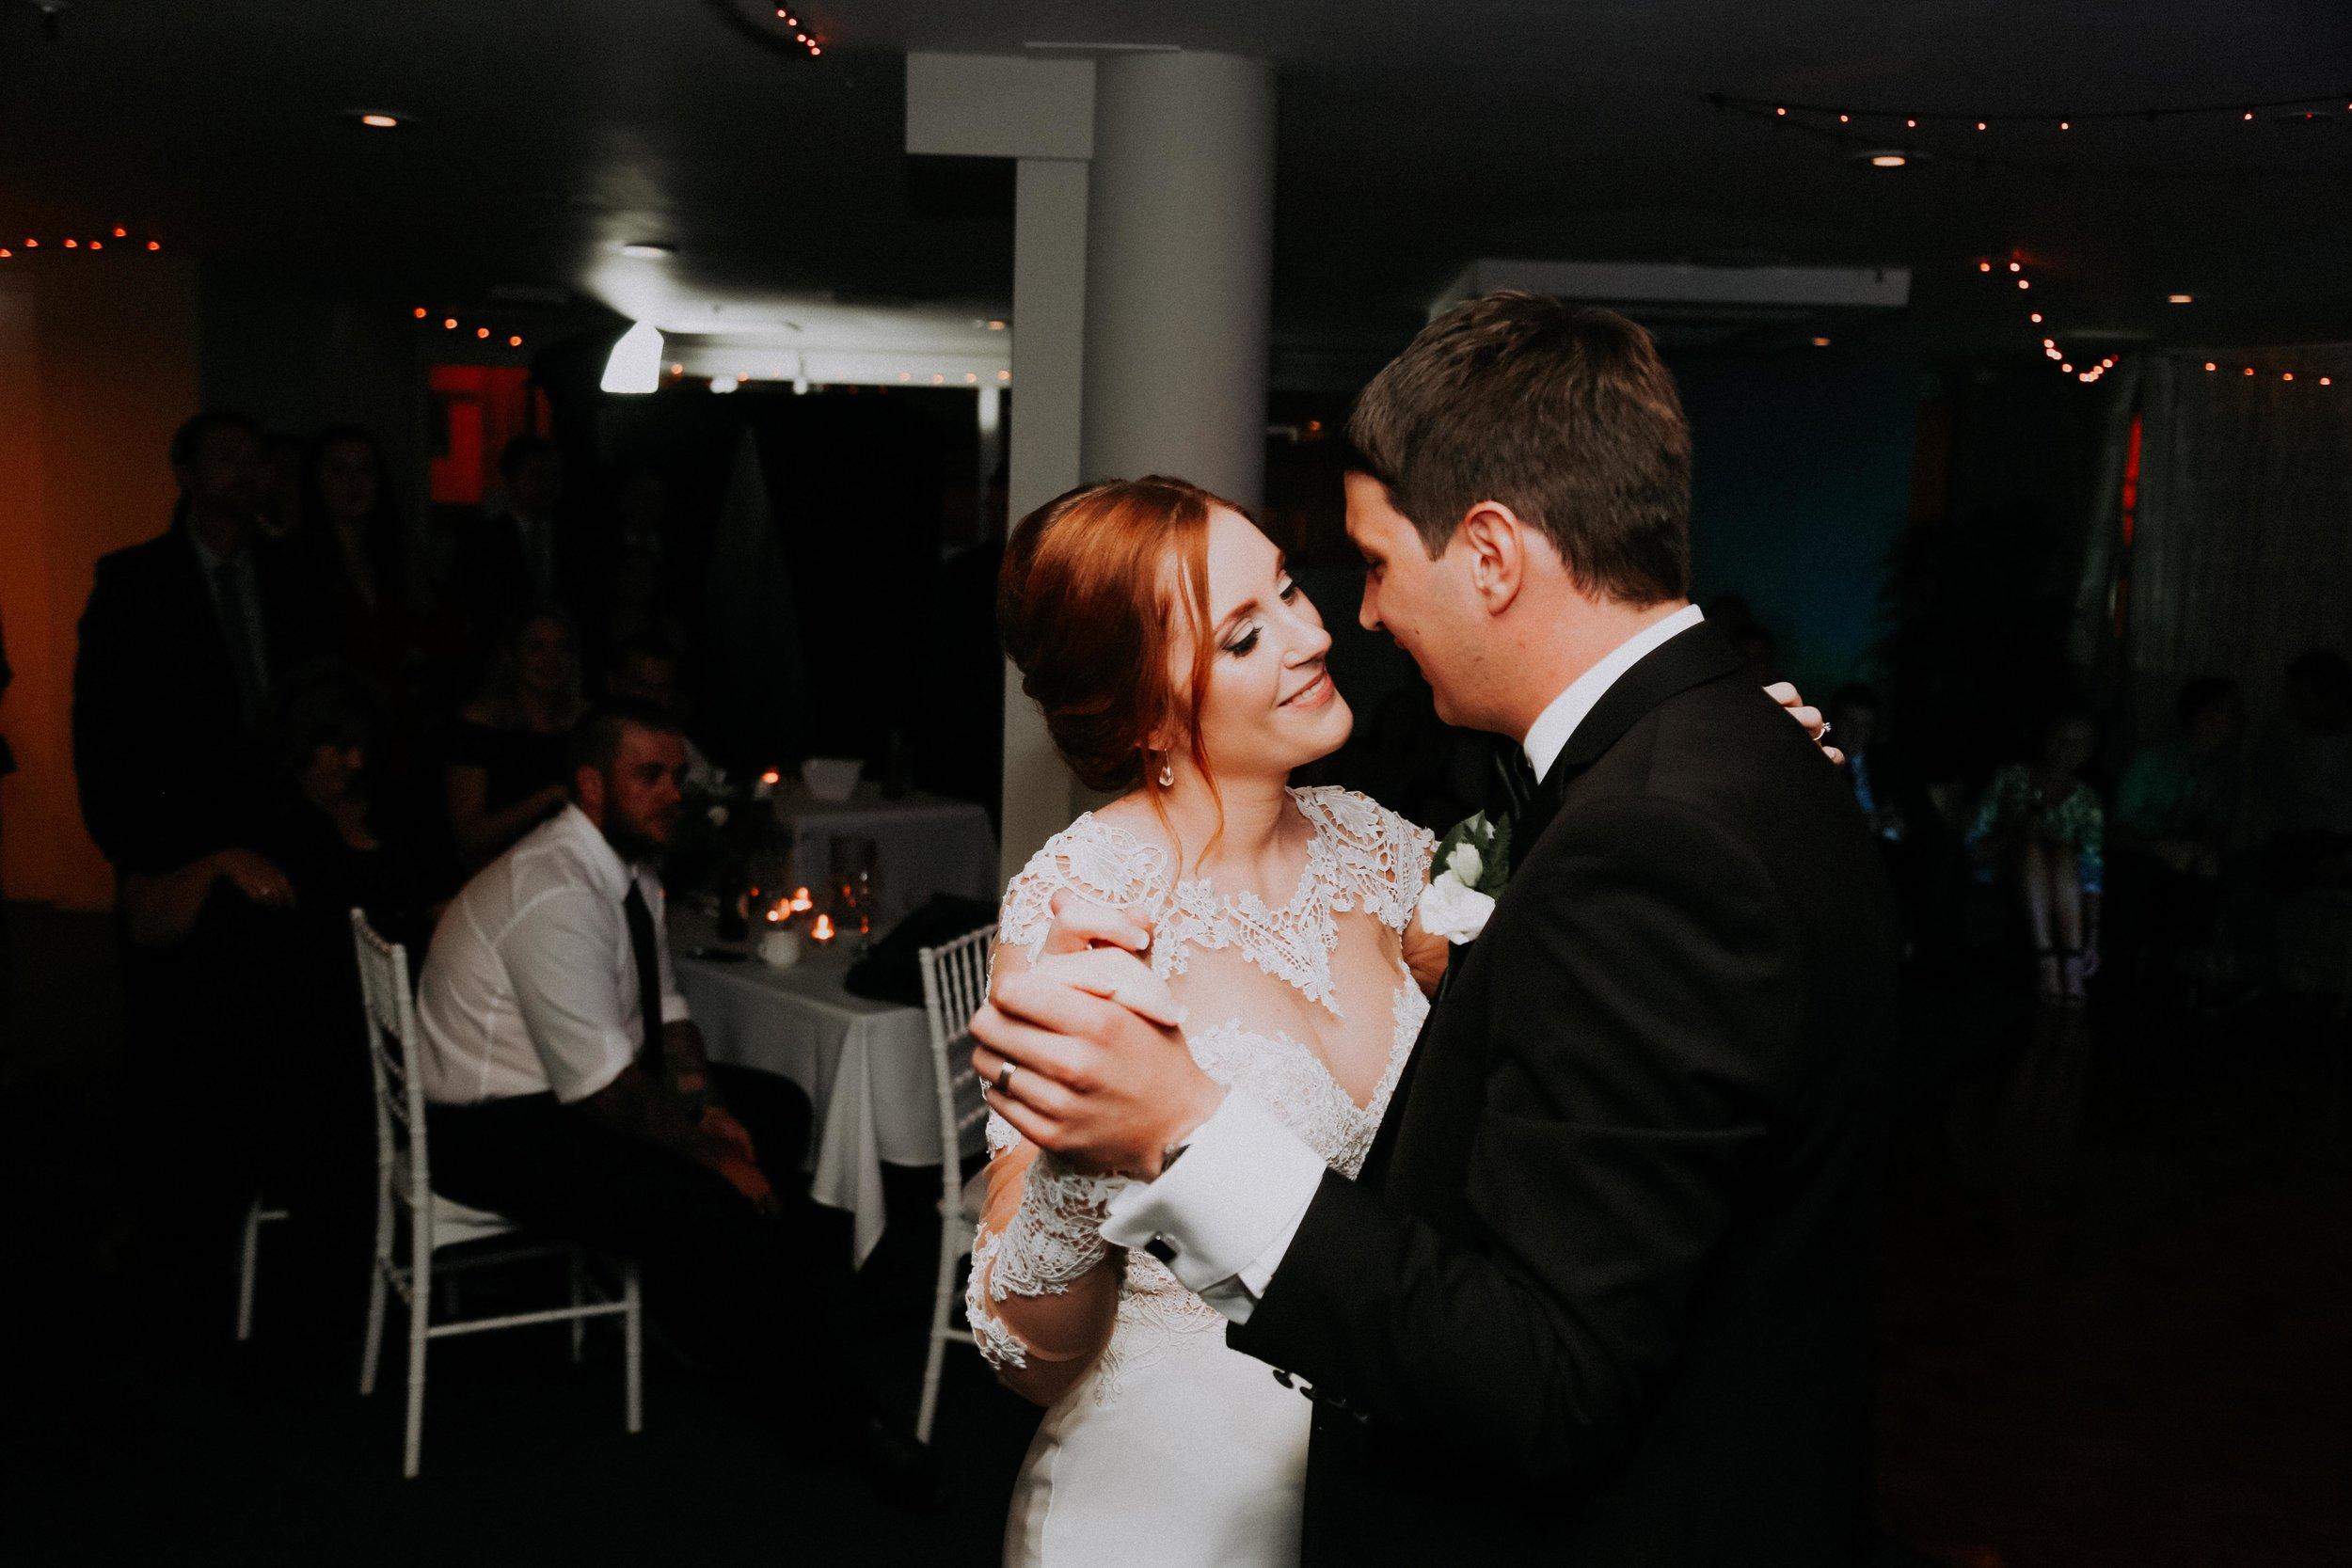 Monique + Nick Vincent - Wedding Photos FINALS-471.jpg